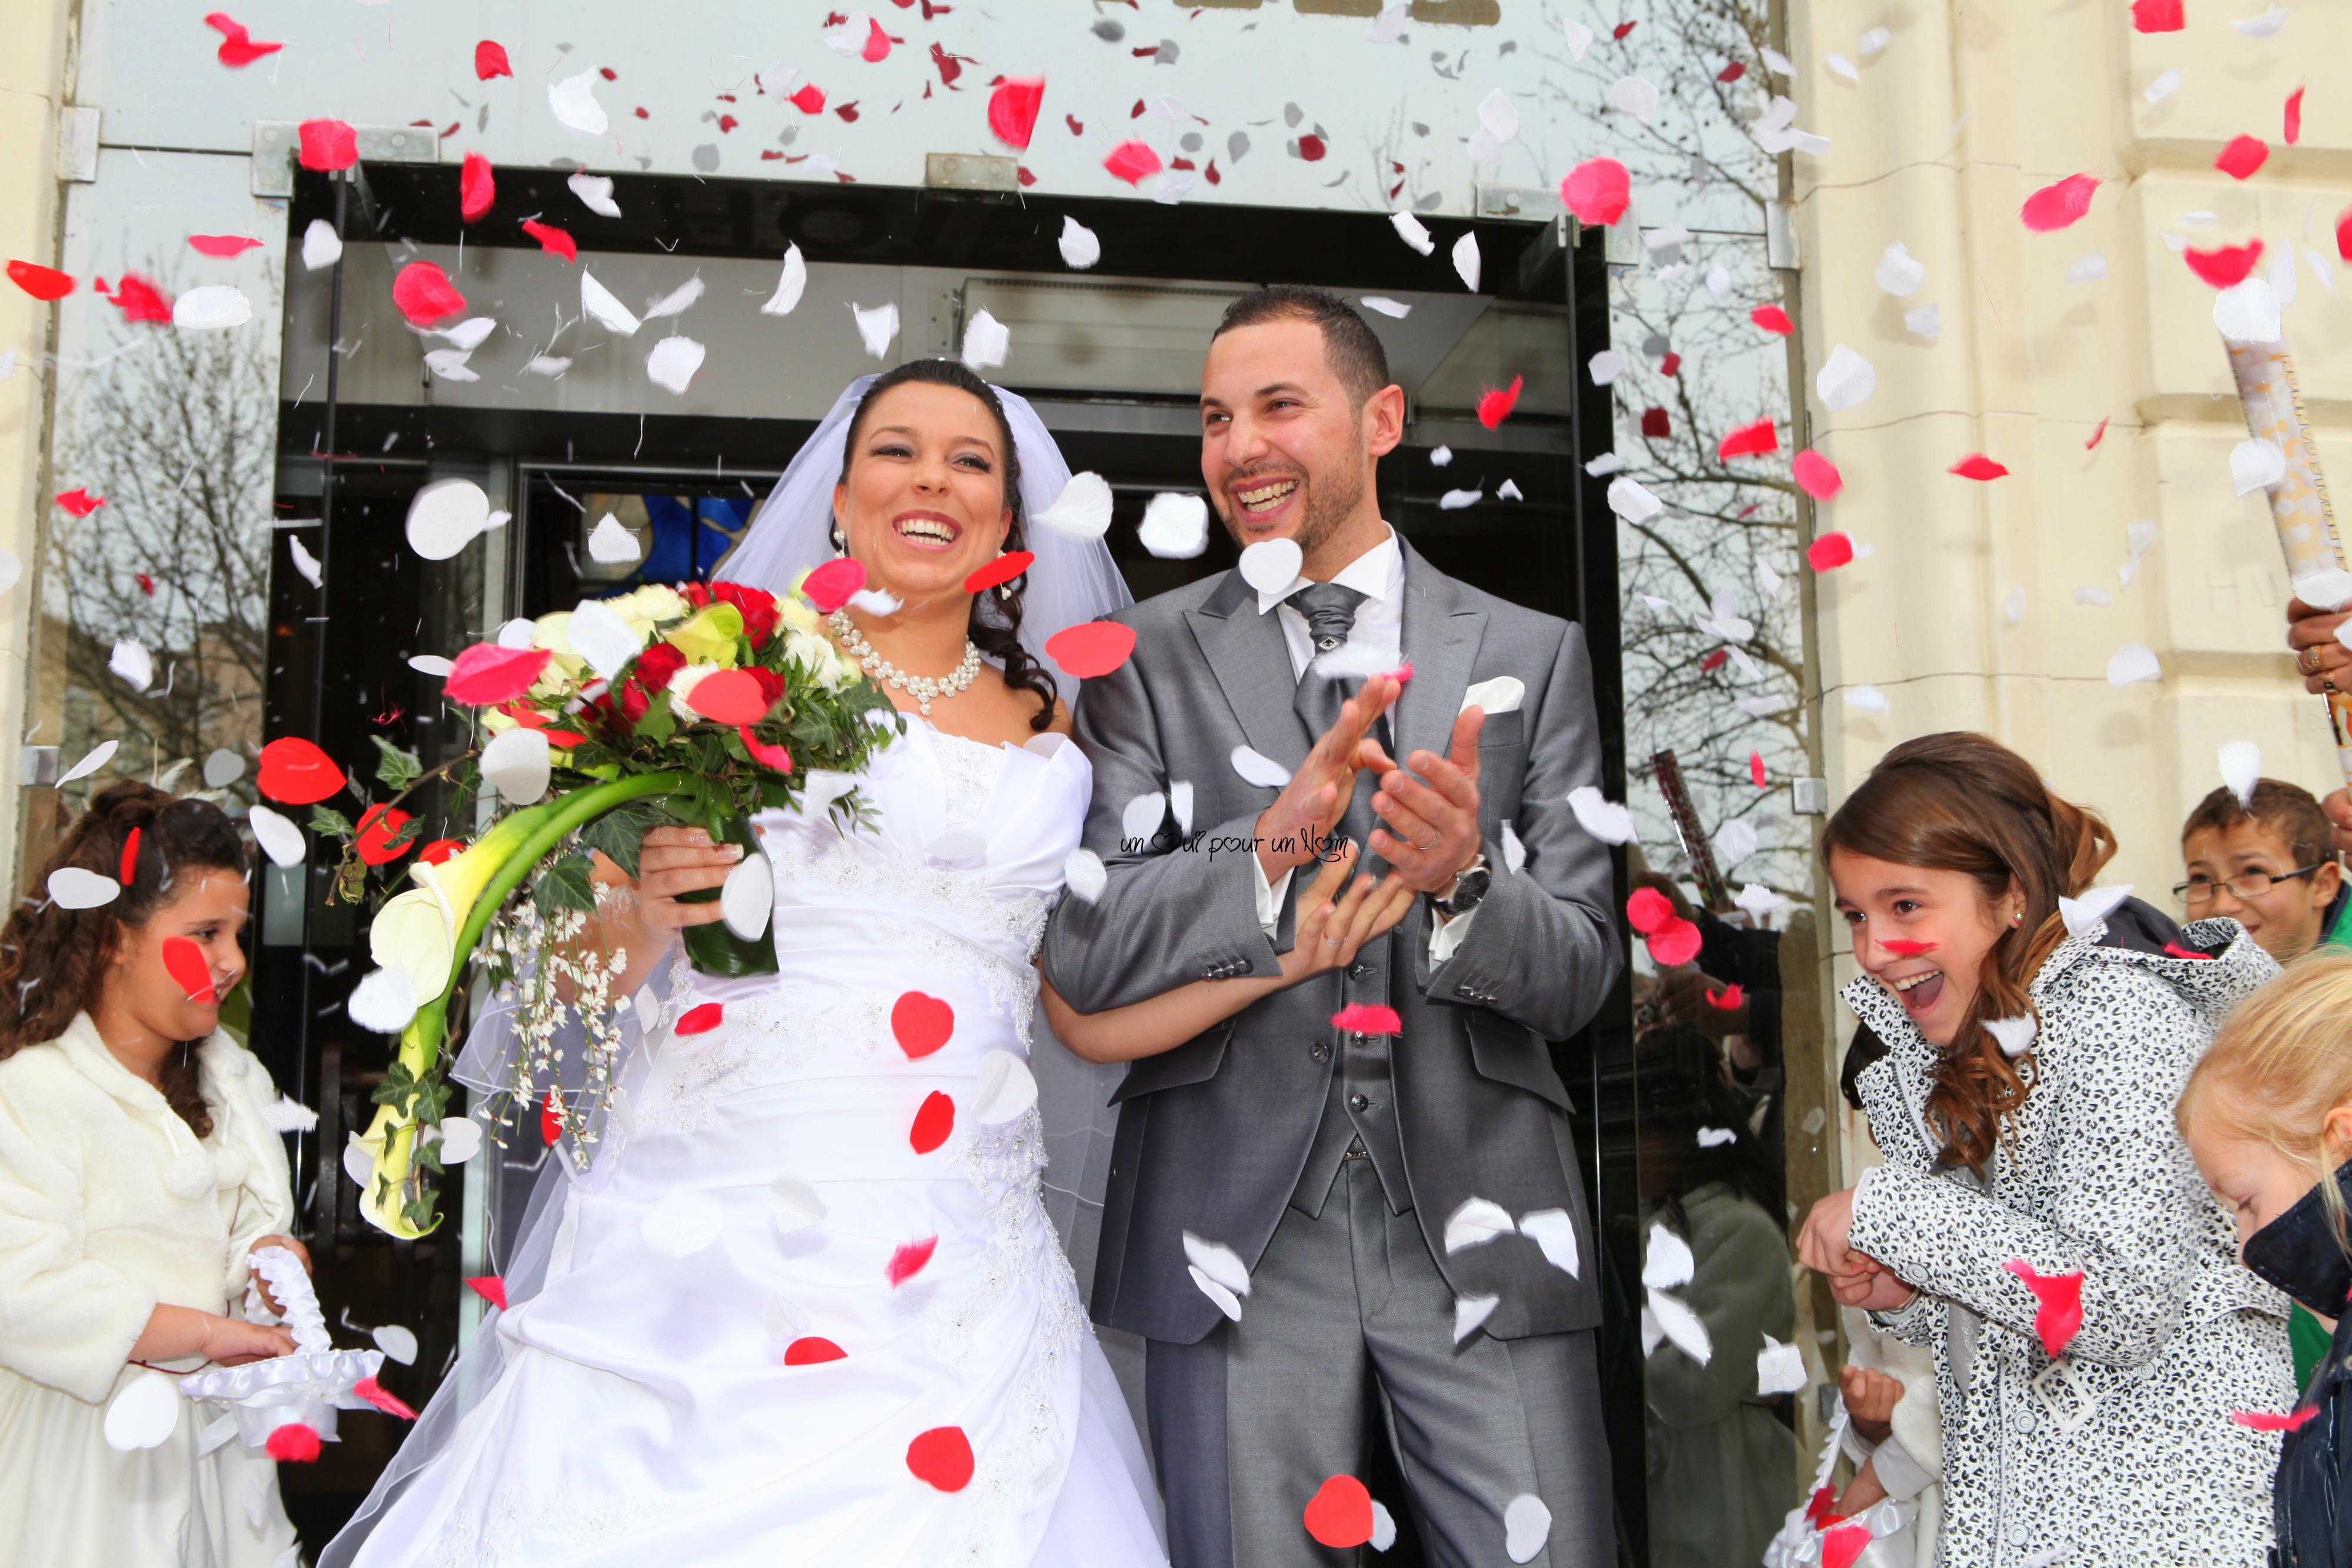 photographe cameraman mariage oriental als - Photographe Mariage Oriental